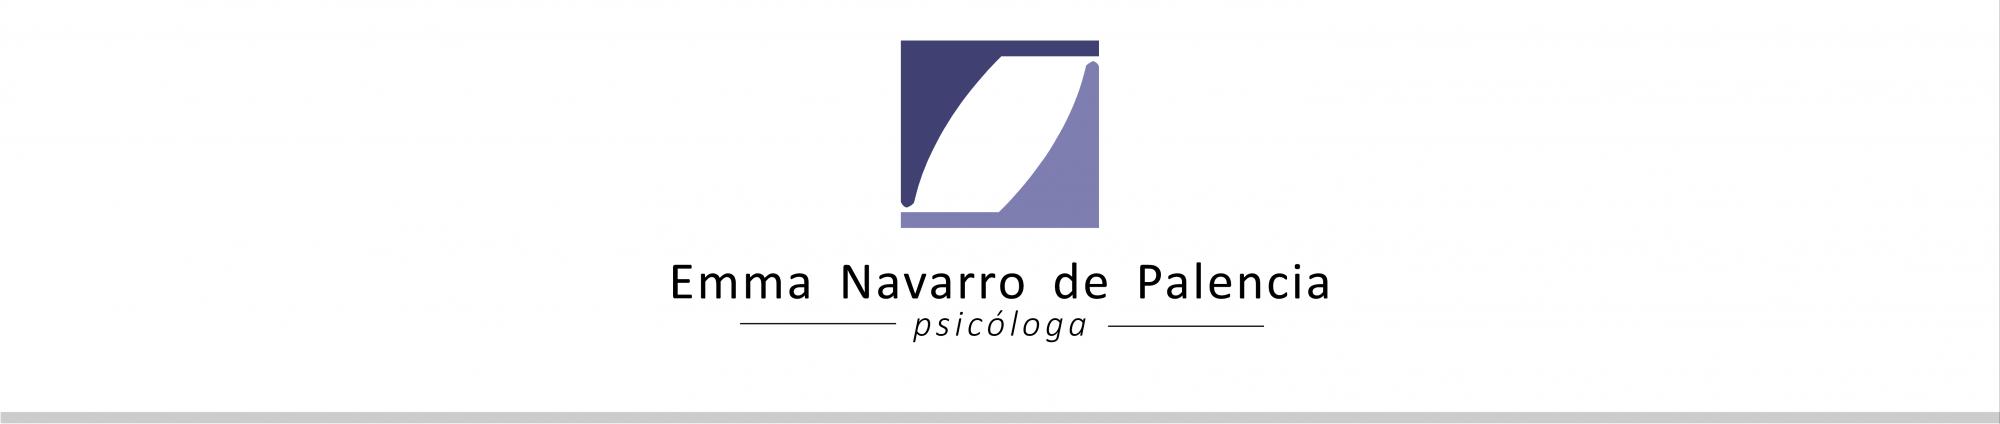 Psicóloga Emmna Navarro de Palencia